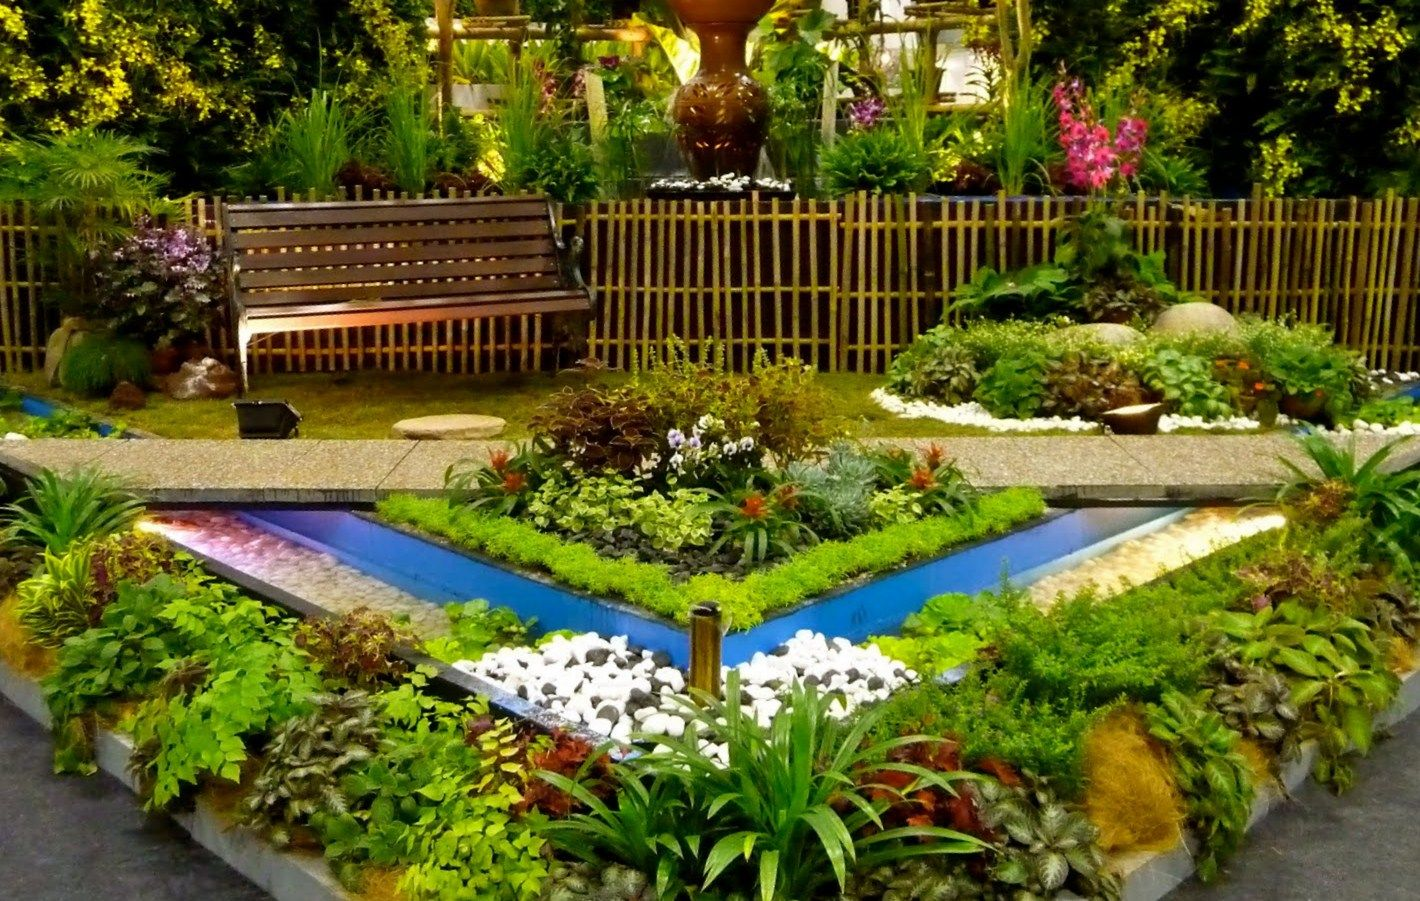 Home garden design flower  Flower and vegetabler Garden Designs  Beautiful Organic Garden